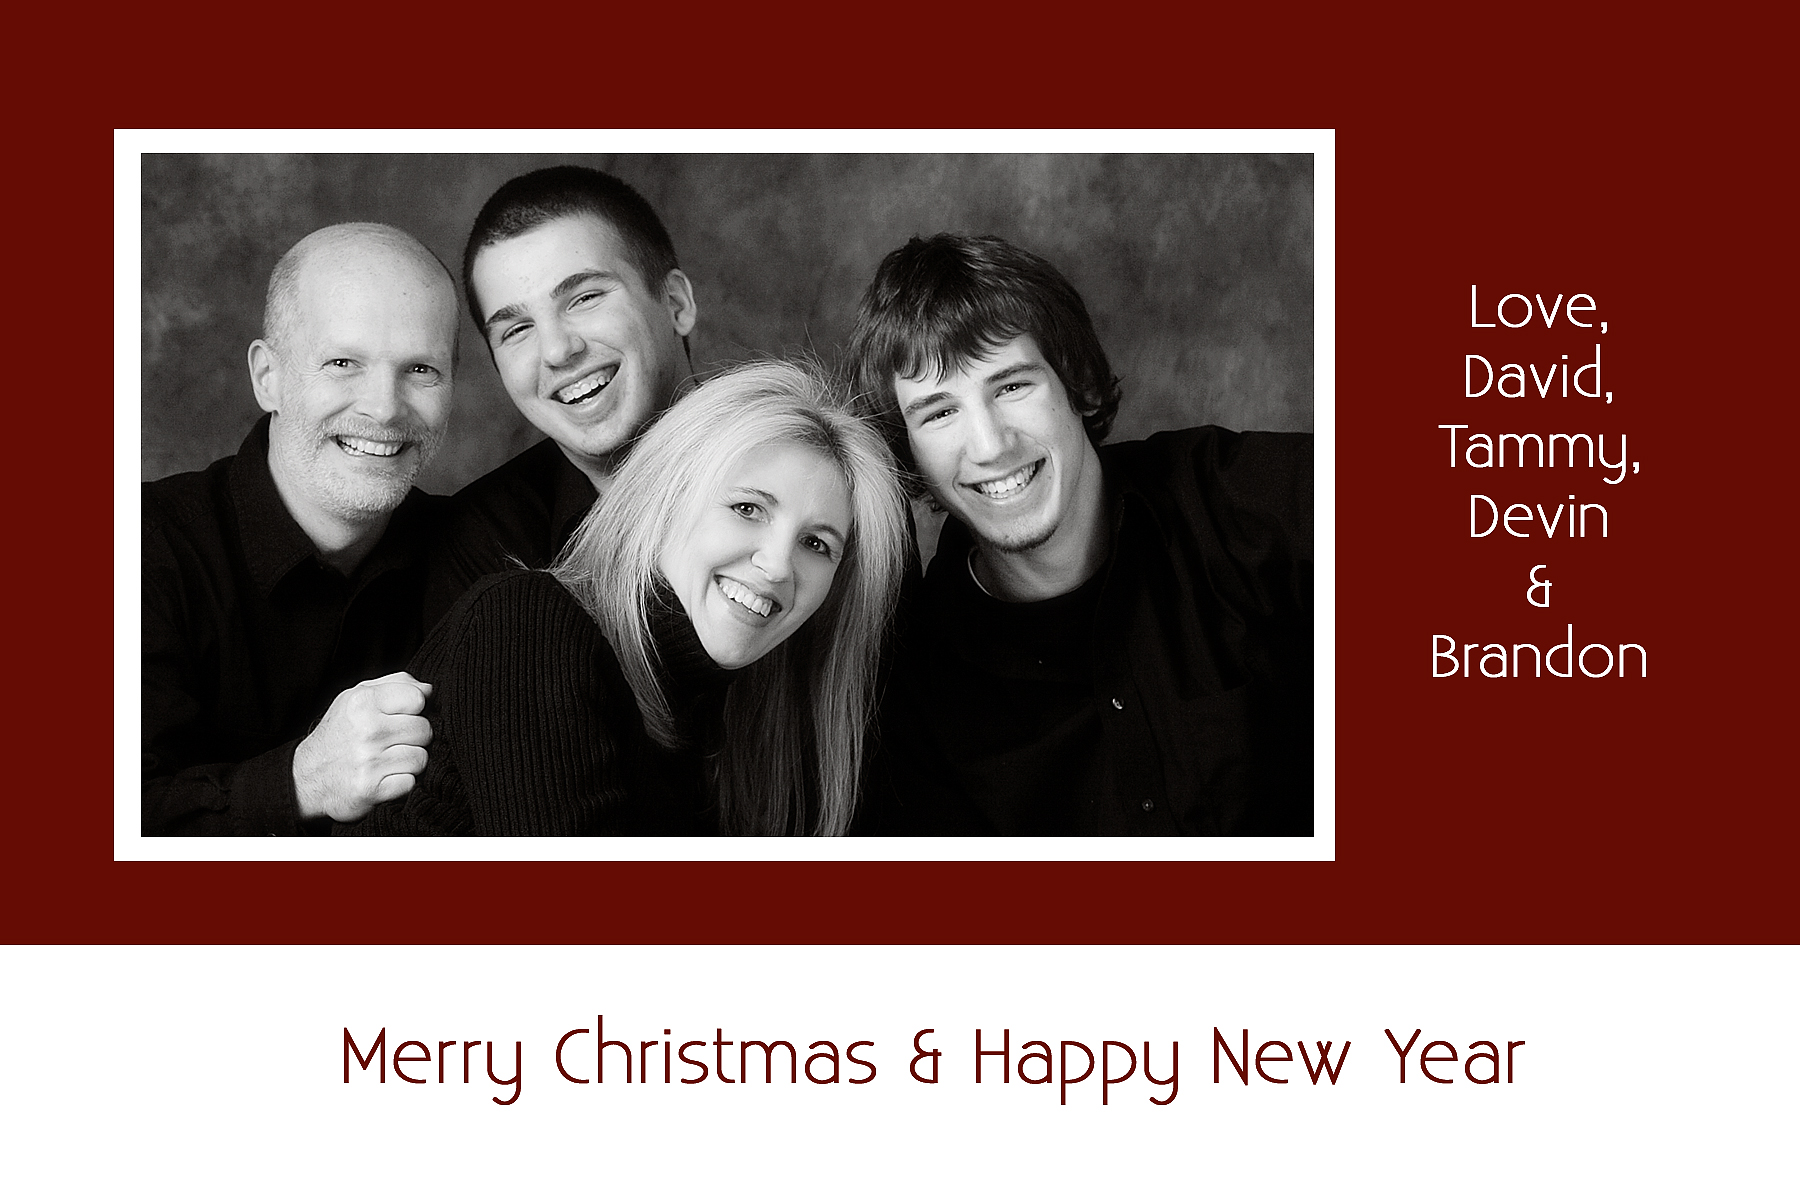 christmas card templates jpg and psd be a leading lady jpg 0003